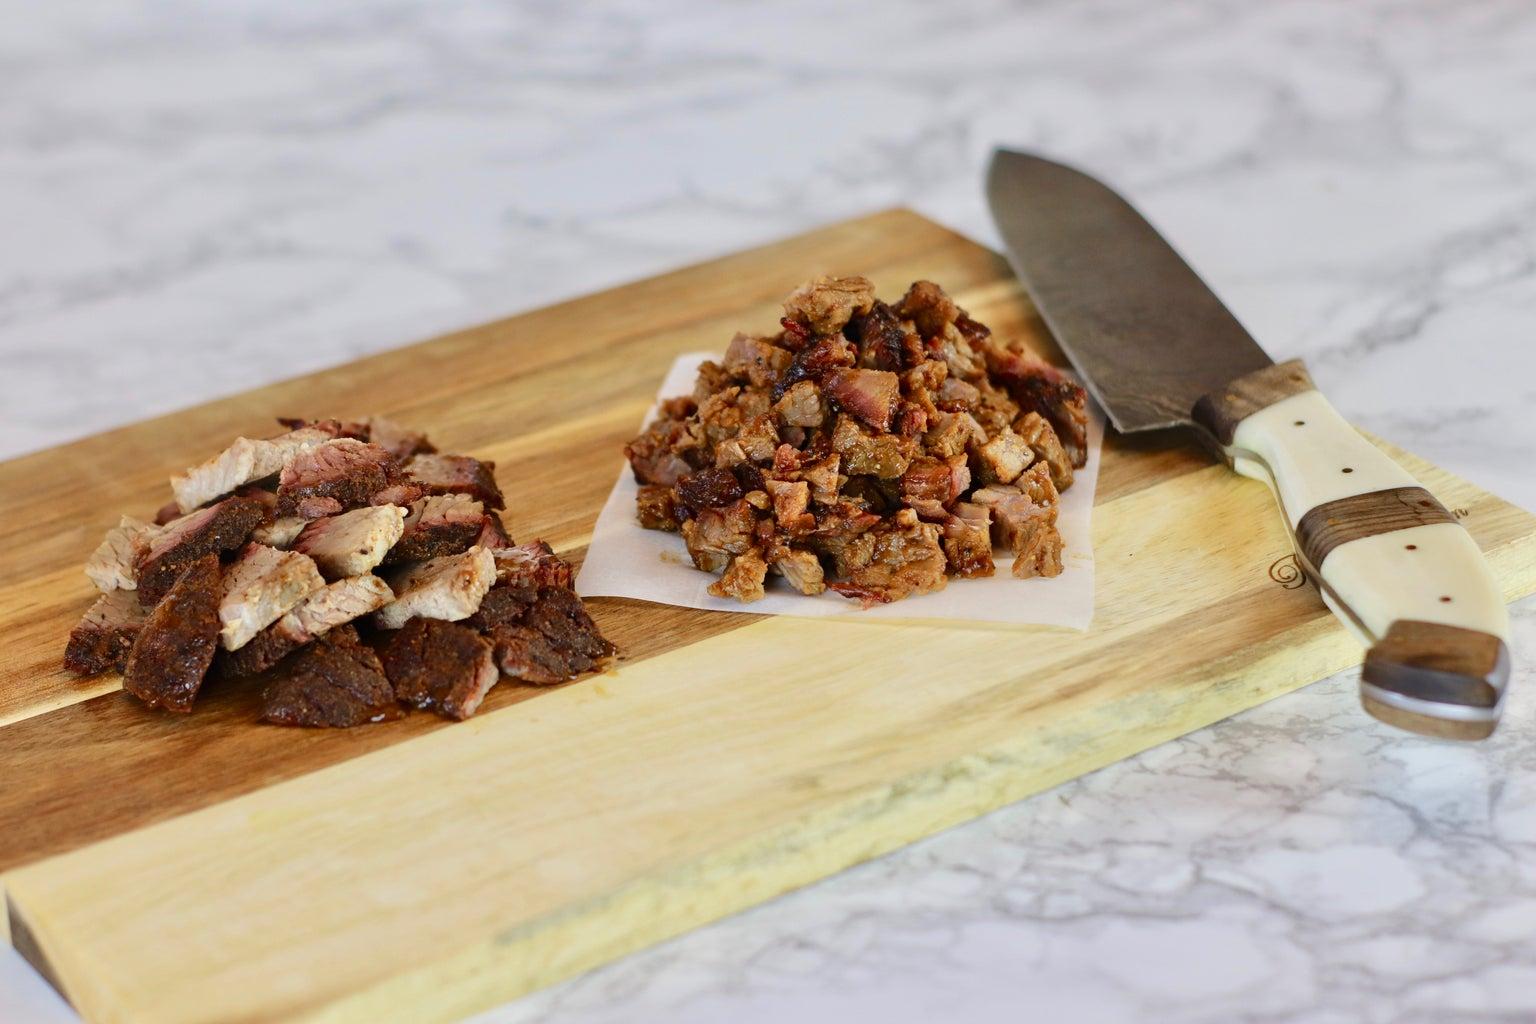 Recipe 1: BBQ Brisket and Burnt End Pizza